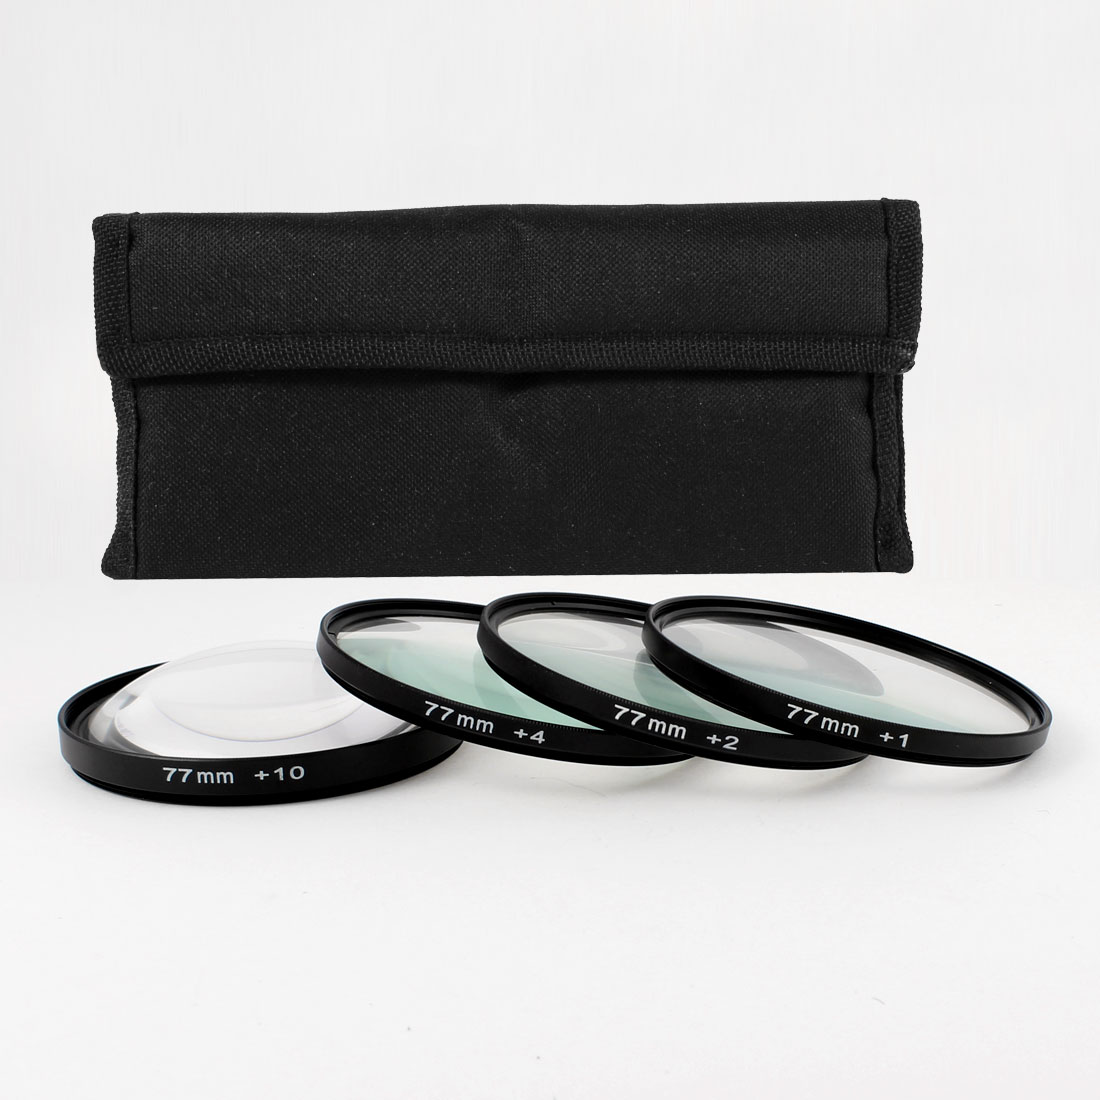 77mm Macro Close Up Lens +1 +2 +4 +10 Filter Kit for DSLR SLR Camera